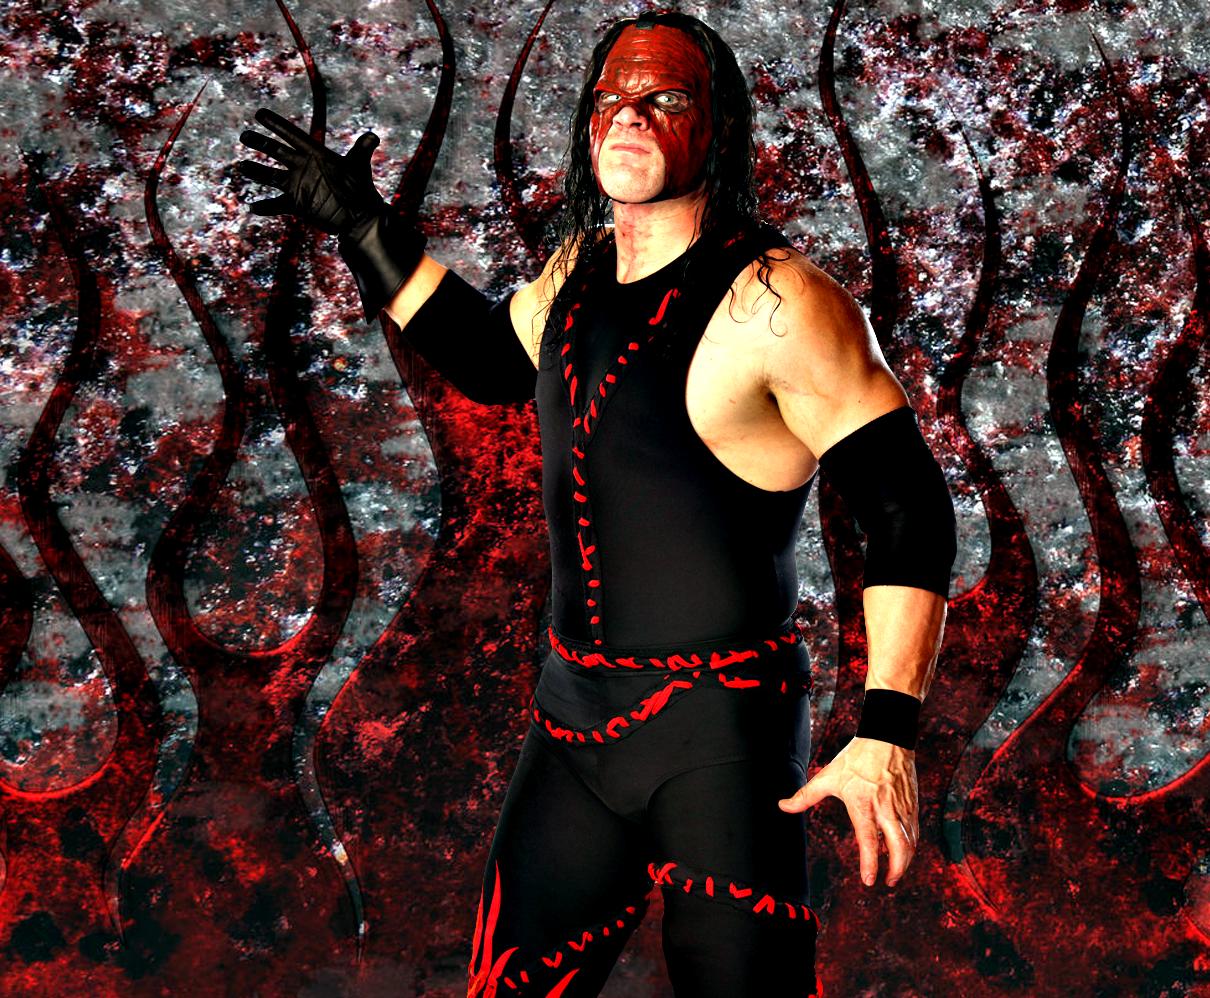 Kane WWE Latest HD Wallpaper 2013-14